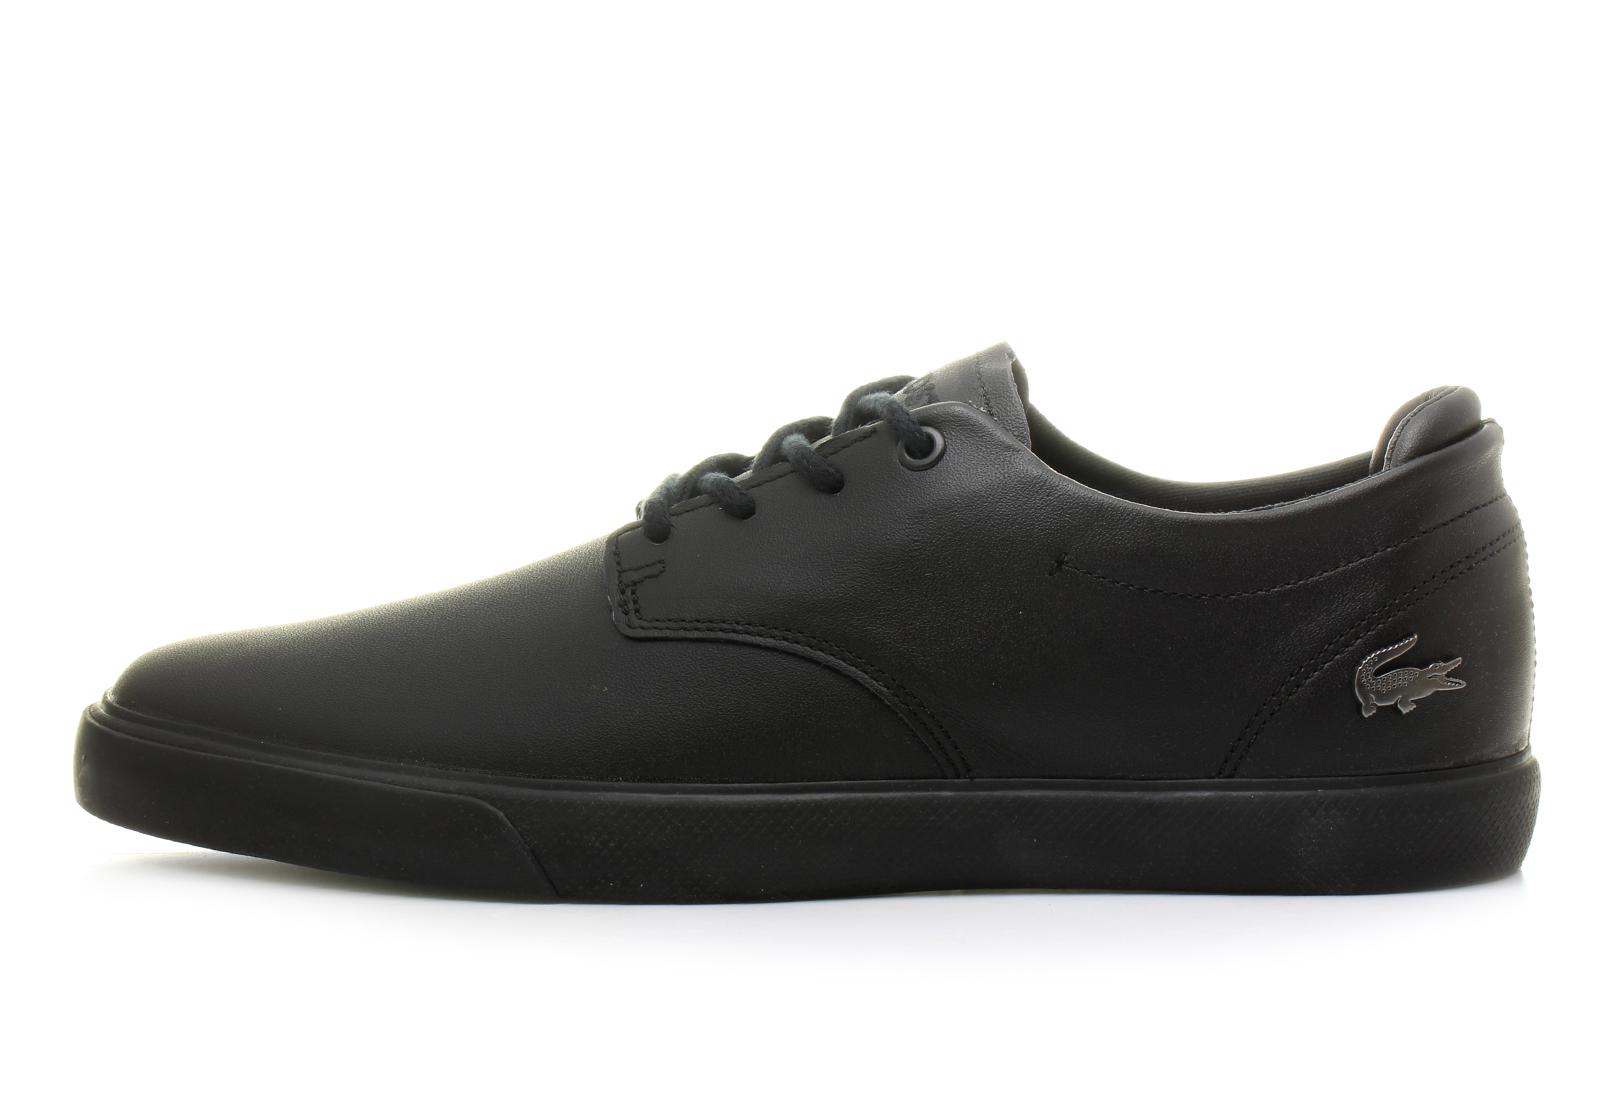 7e3fa629ad1f6 Lacoste Shoes - espere - 171cam1040-024 - Online shop for sneakers ...